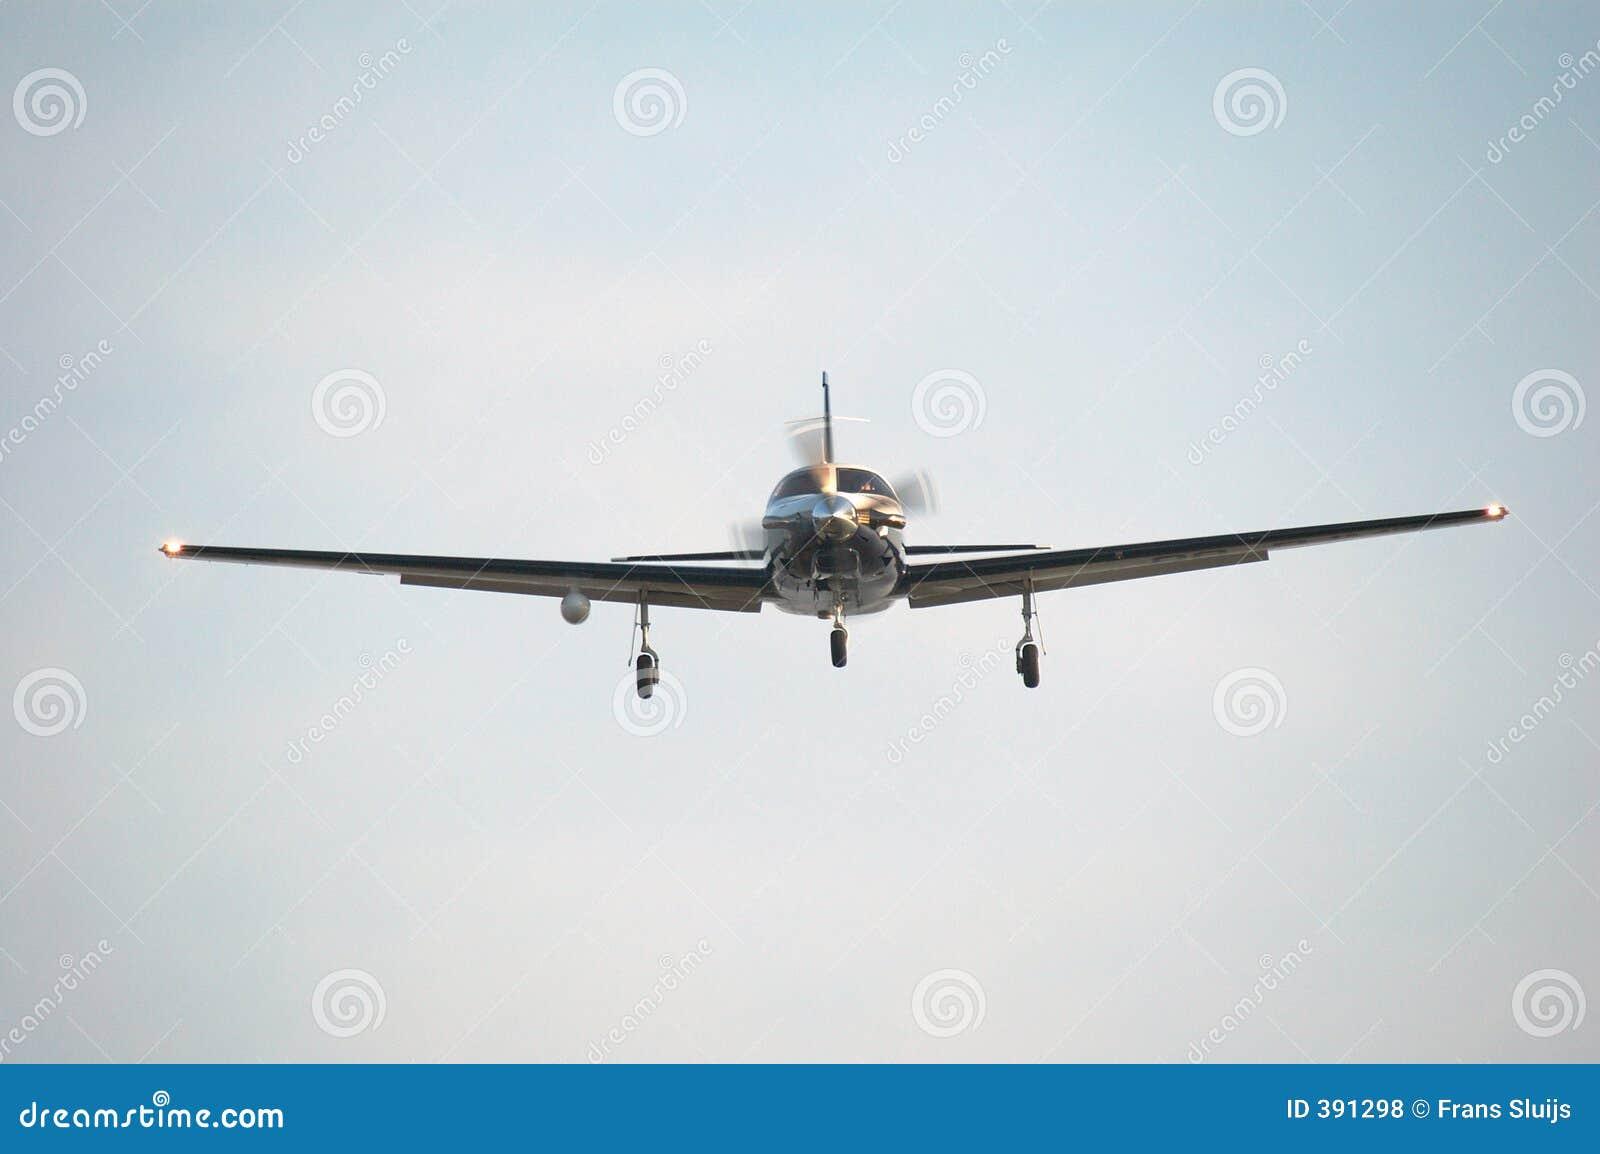 Plane sport